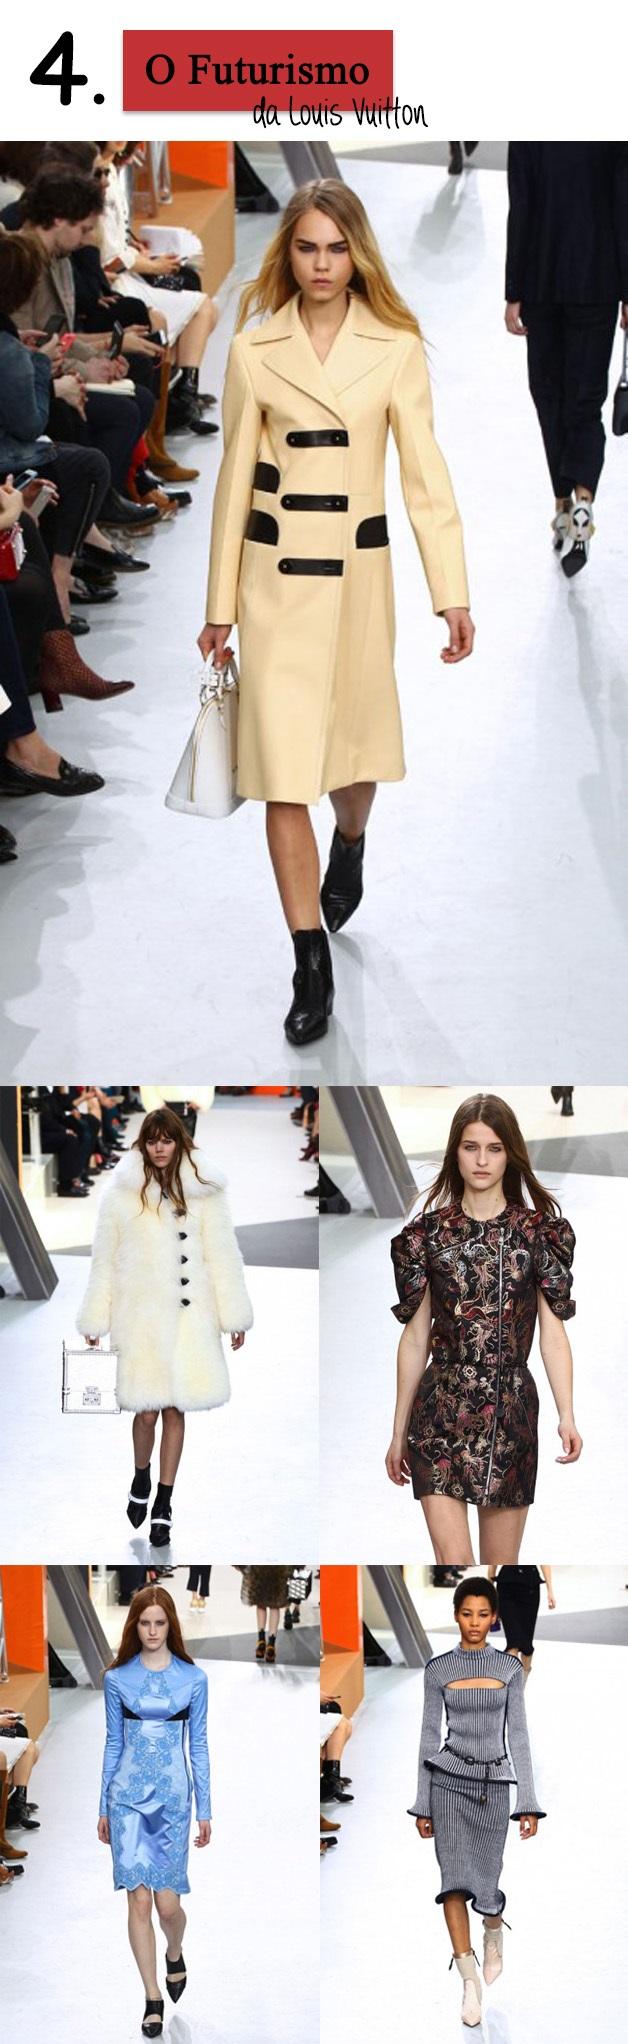 louis-vuitton-paris-fashion-week-carola-duarte